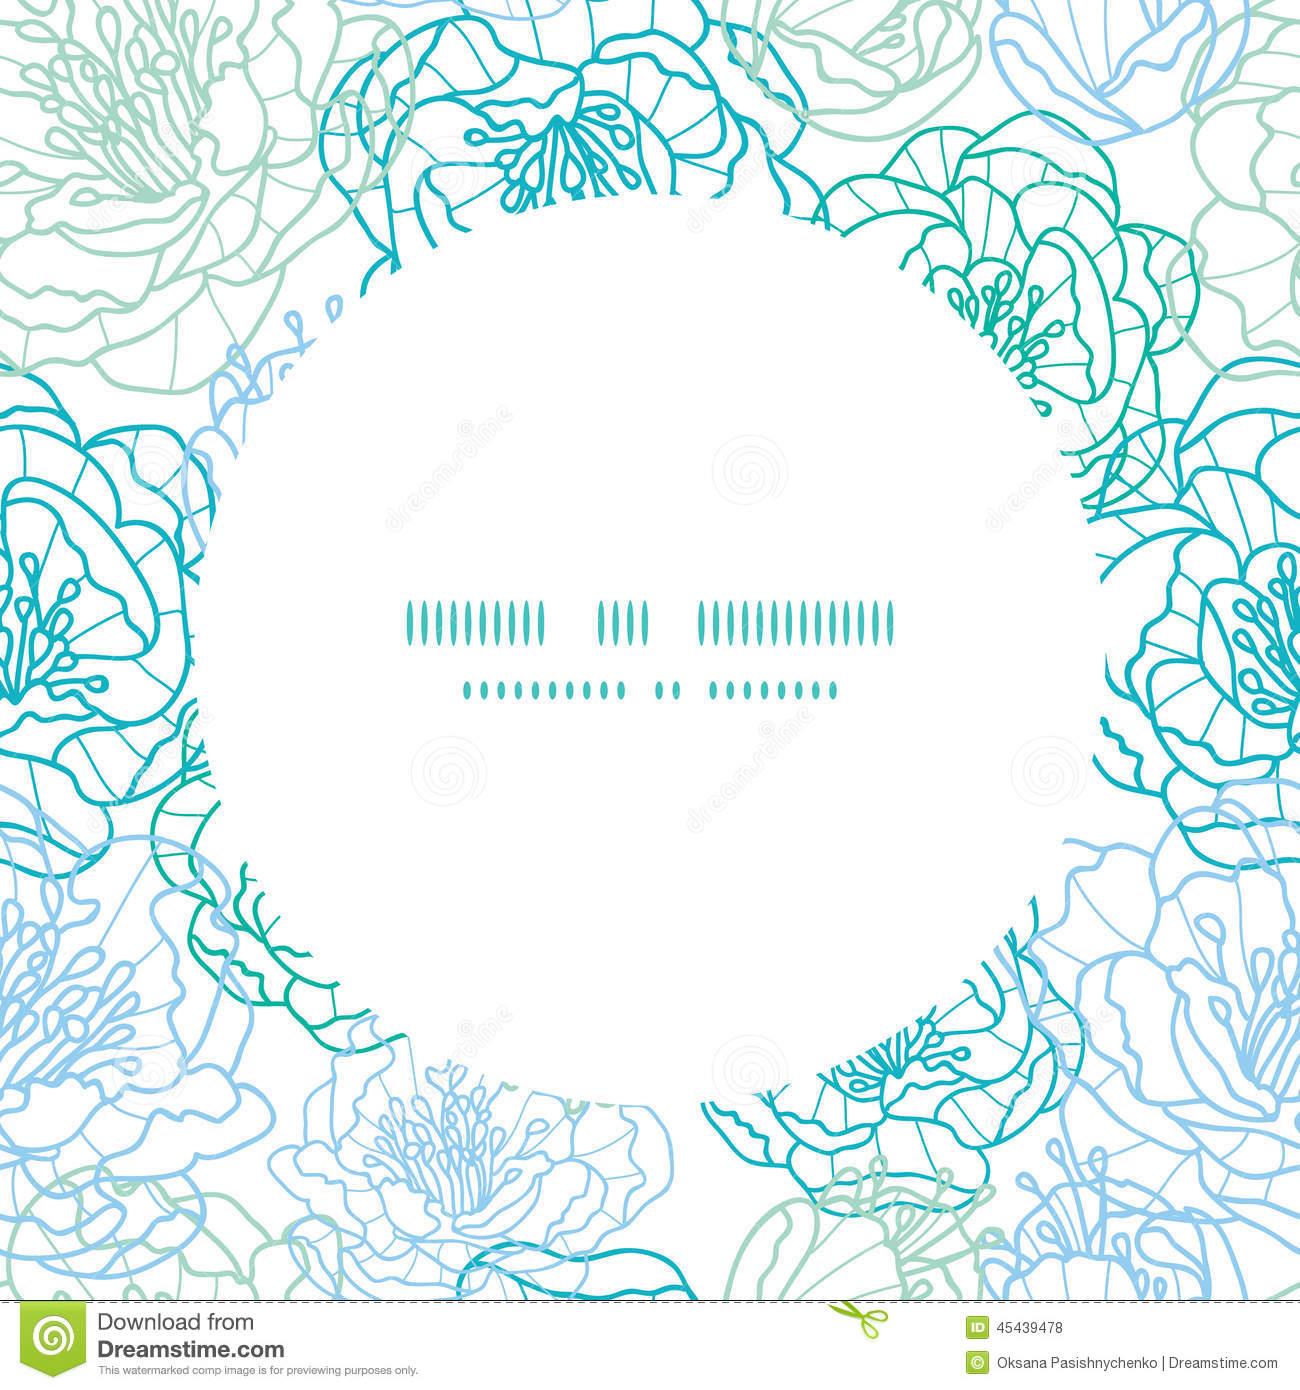 Graphic Line Design Art : D vector line art border images floral